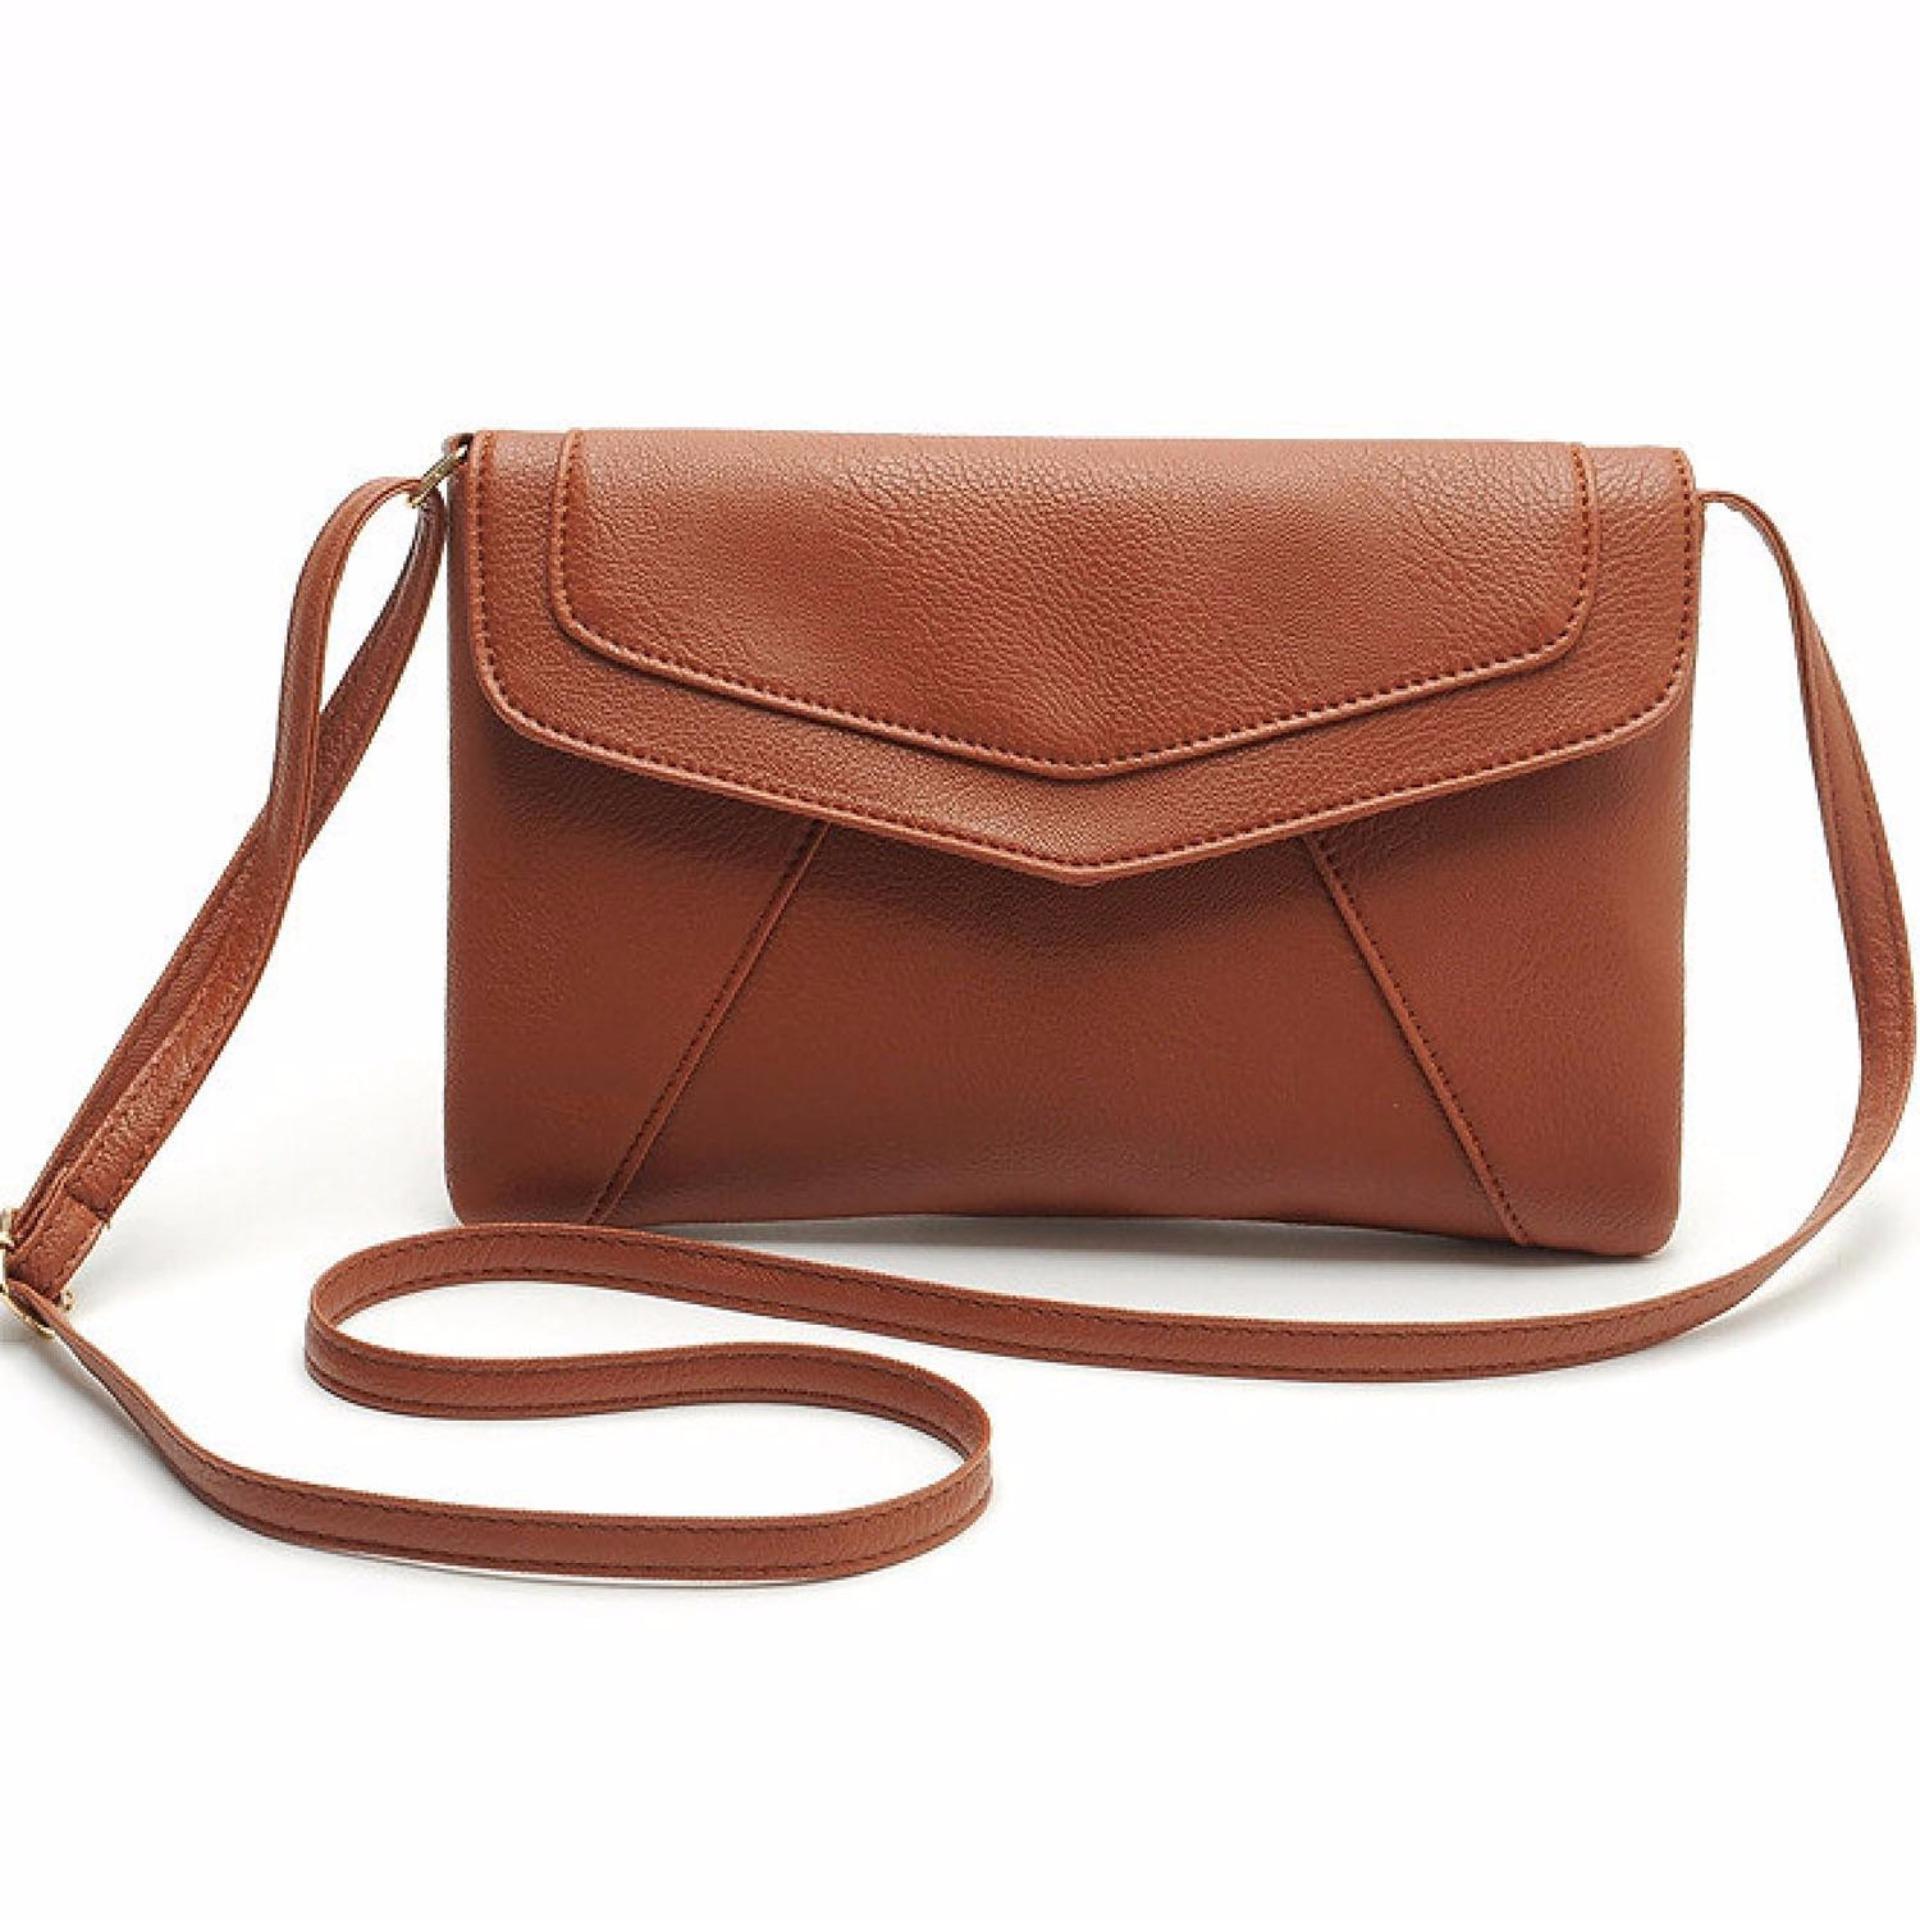 Vienna Linz Tas Selempang Bahu Wanita Jennifer Casual Leather Messenger Handbag s5220 - Brown